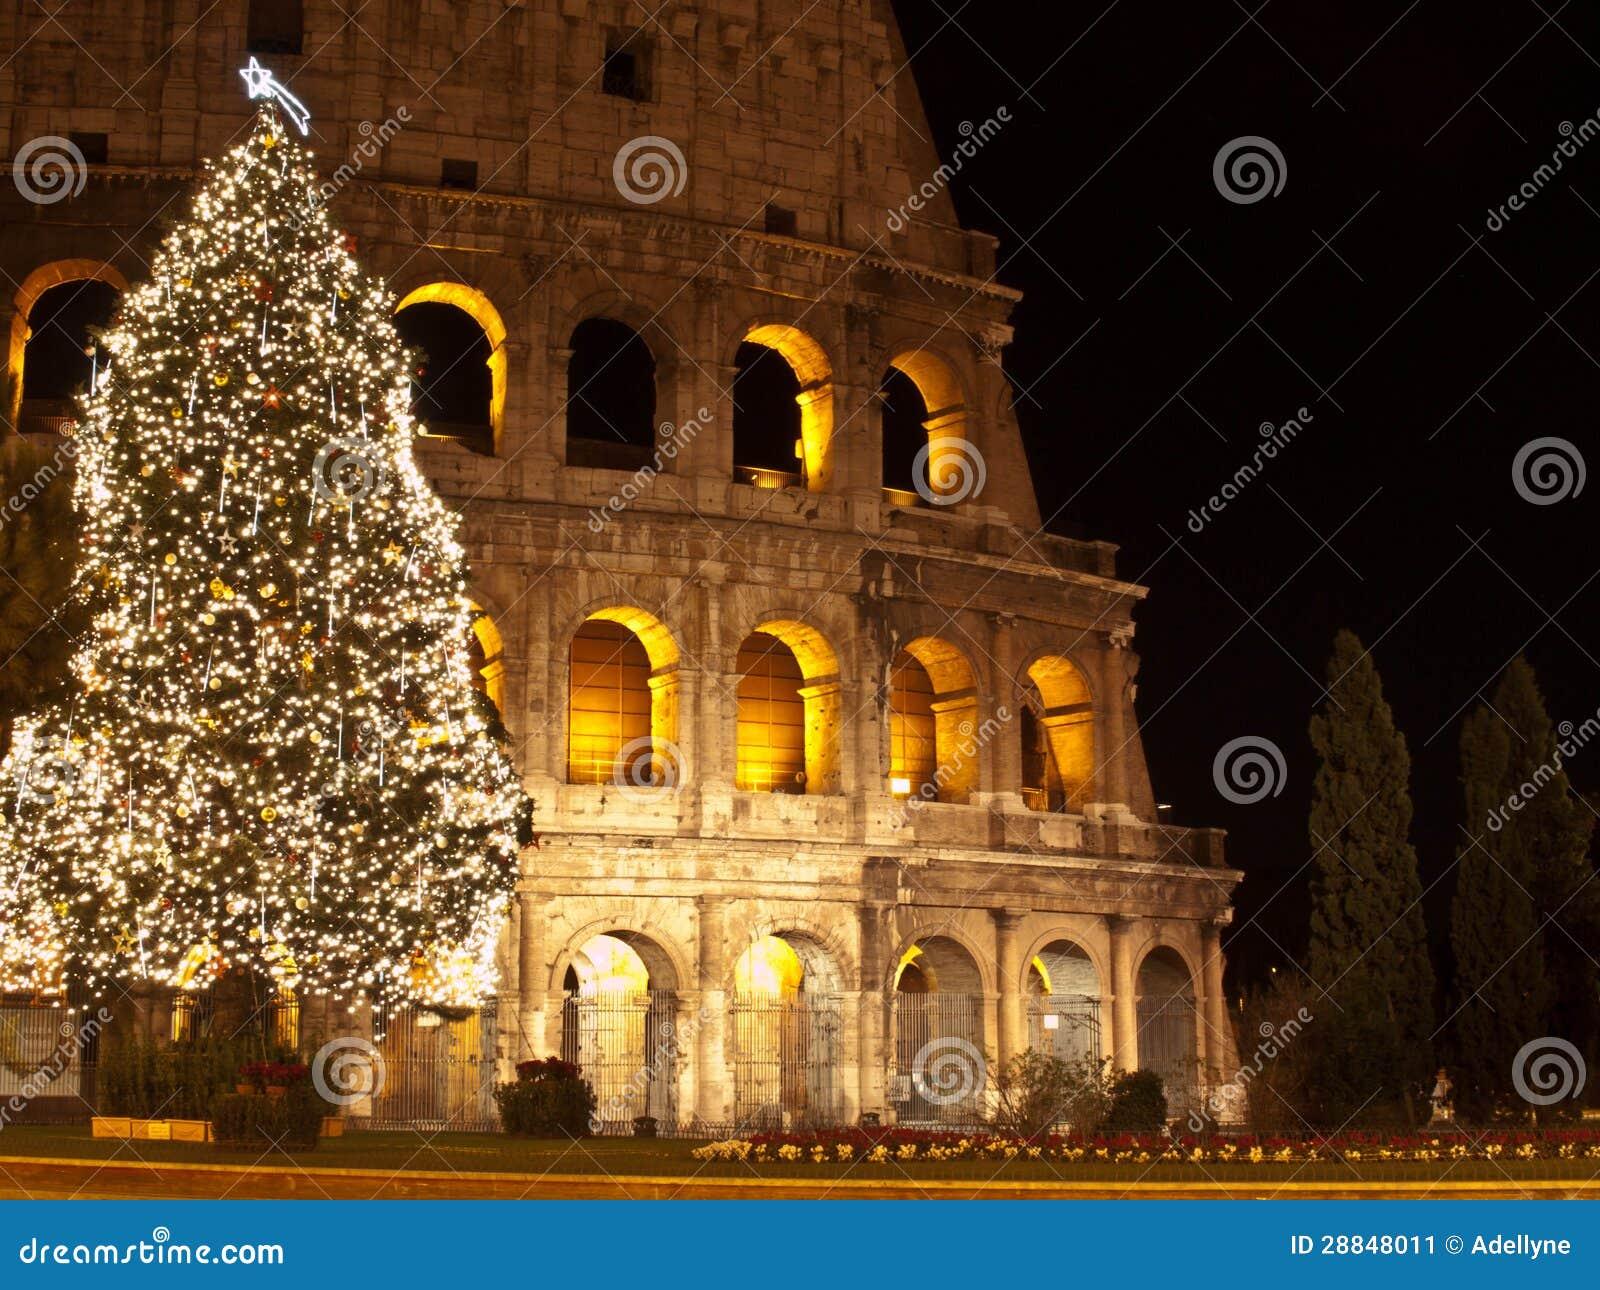 Christmas at Colosseum